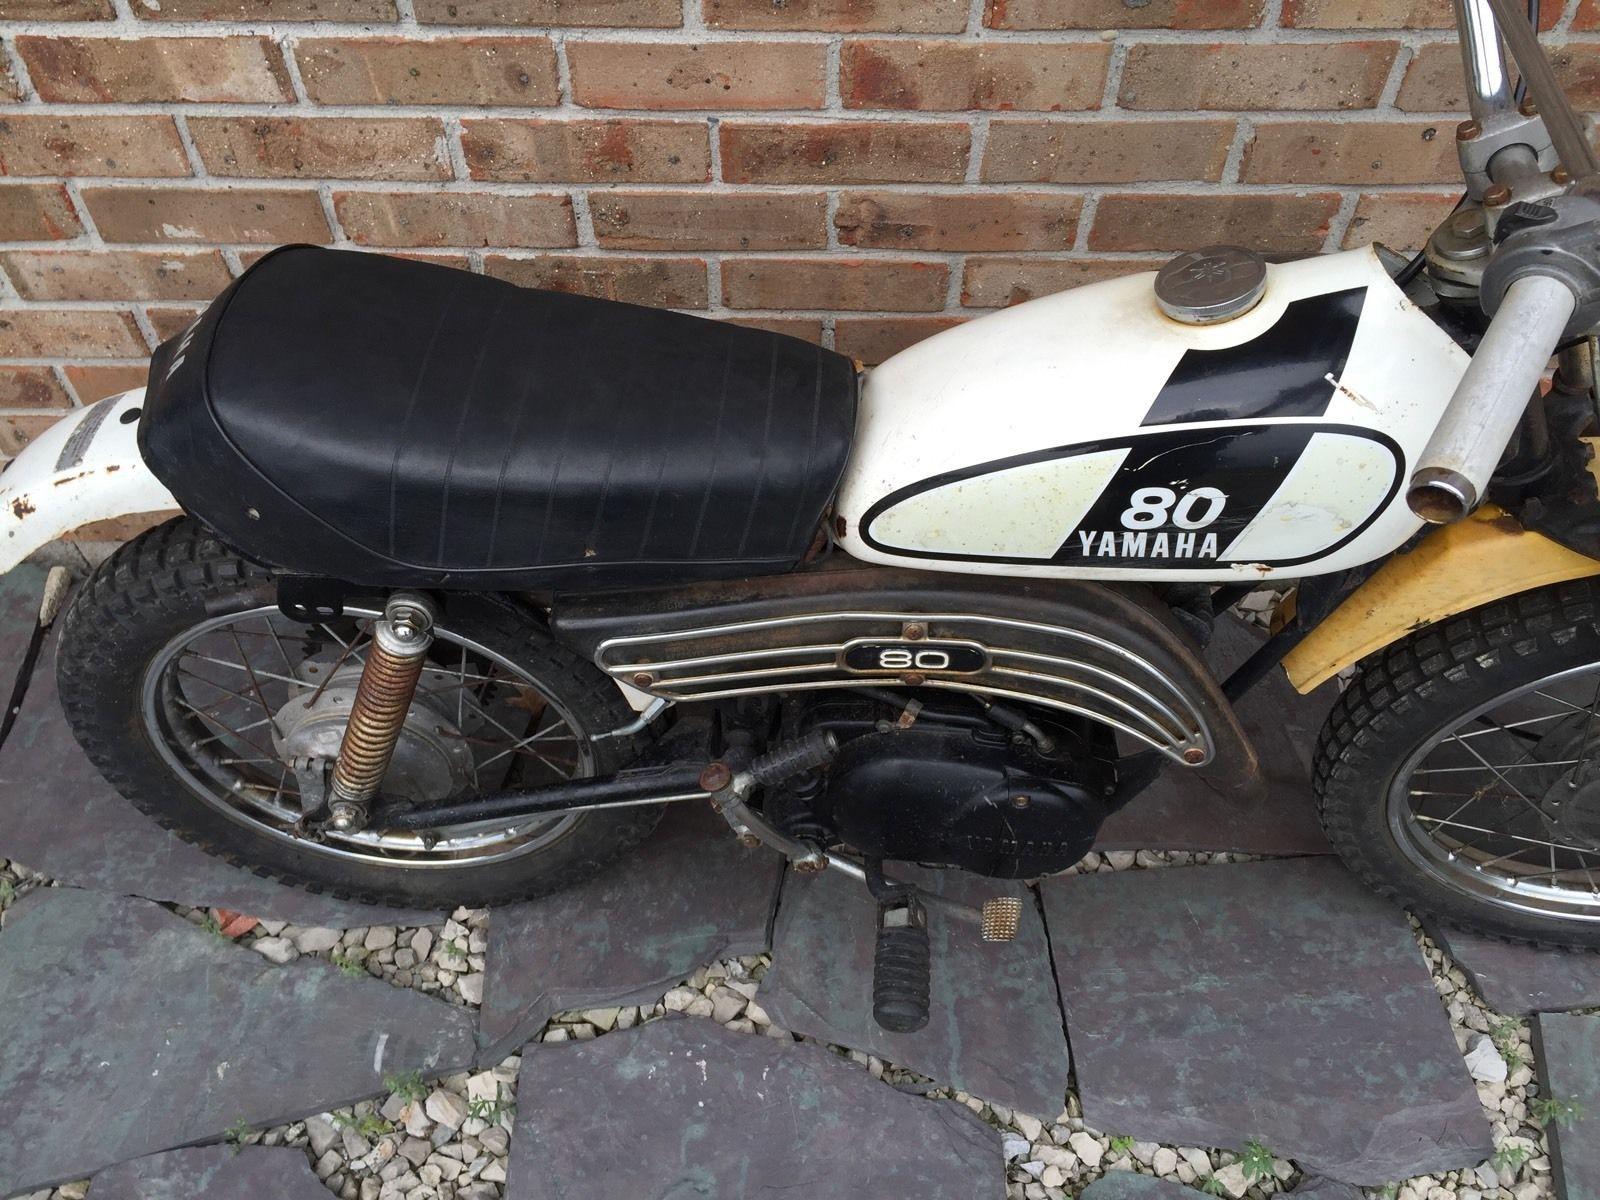 Vintage 1974 Yamaha Gt 80 Mx Mini Dirt Bike For Parts Restoration